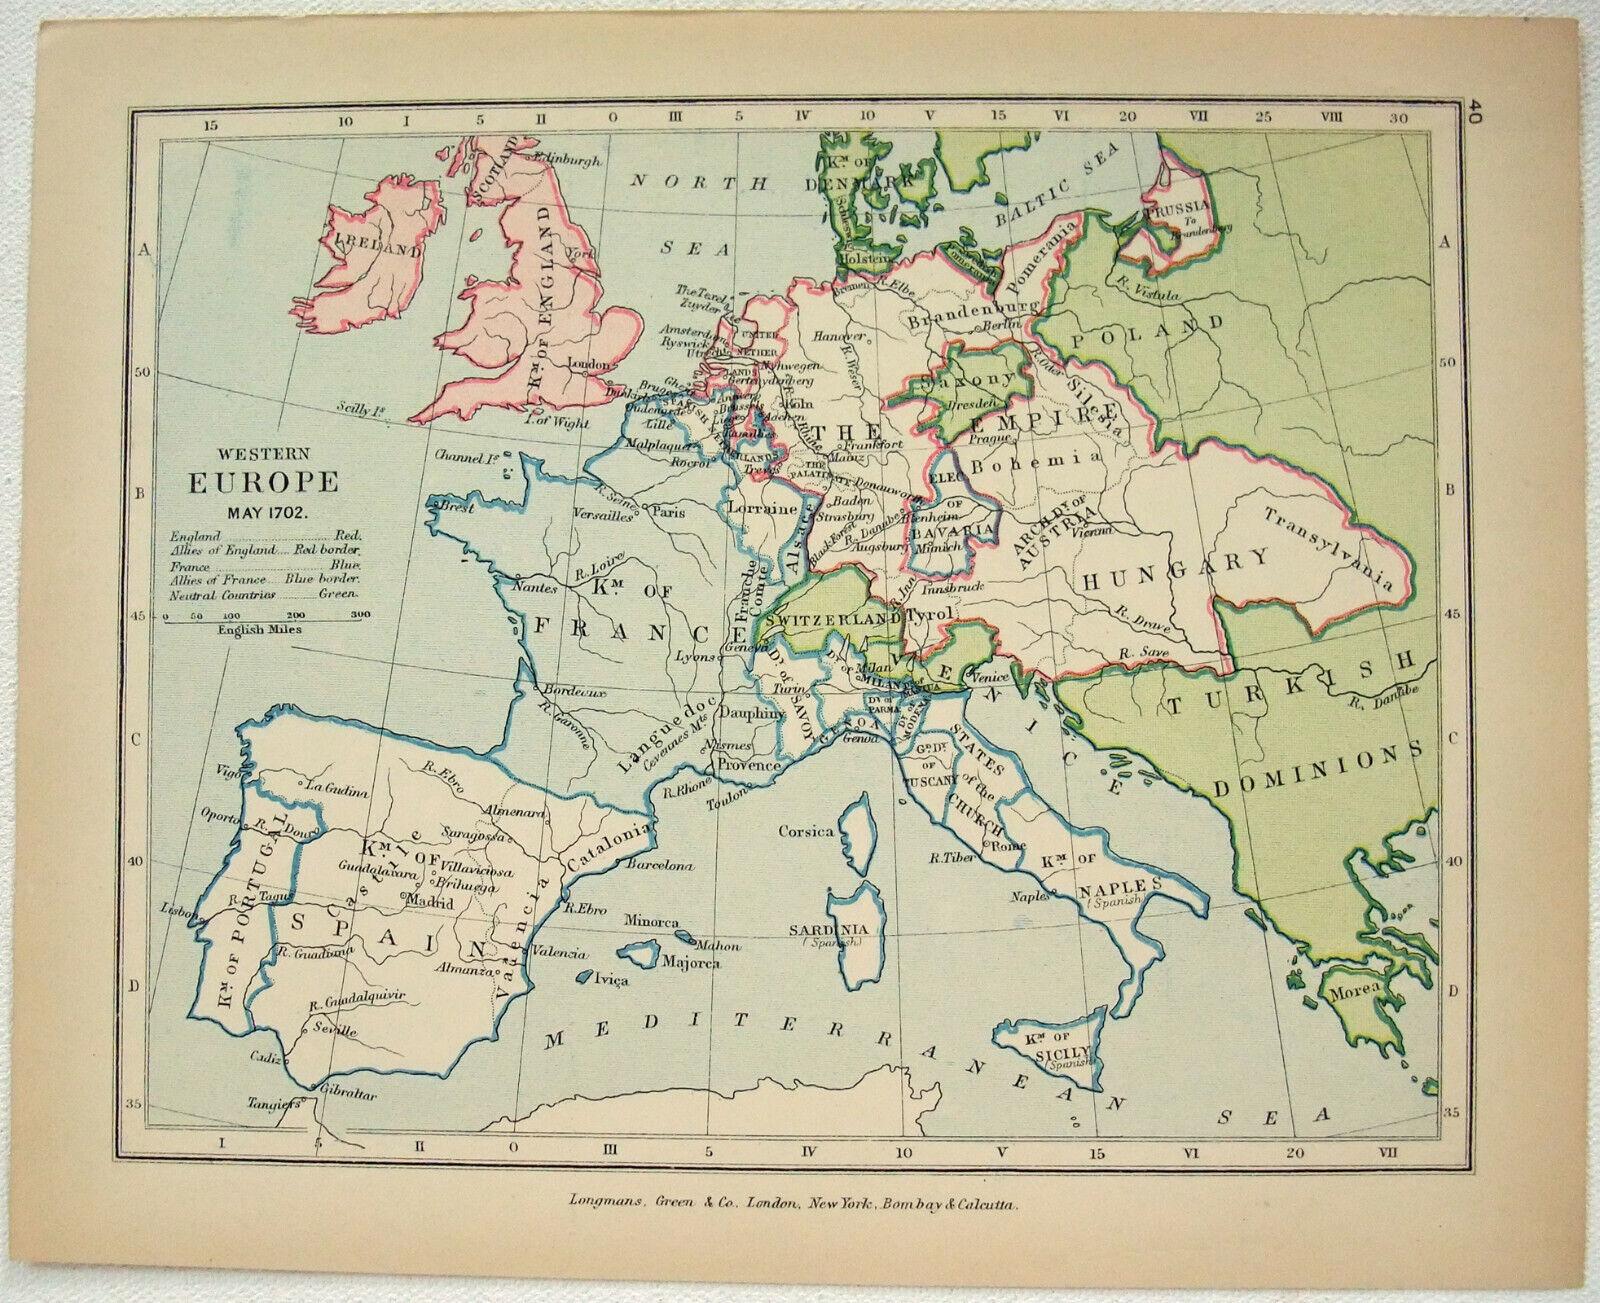 Vintage Map of Western Europe in May 1702 by Longmans Green